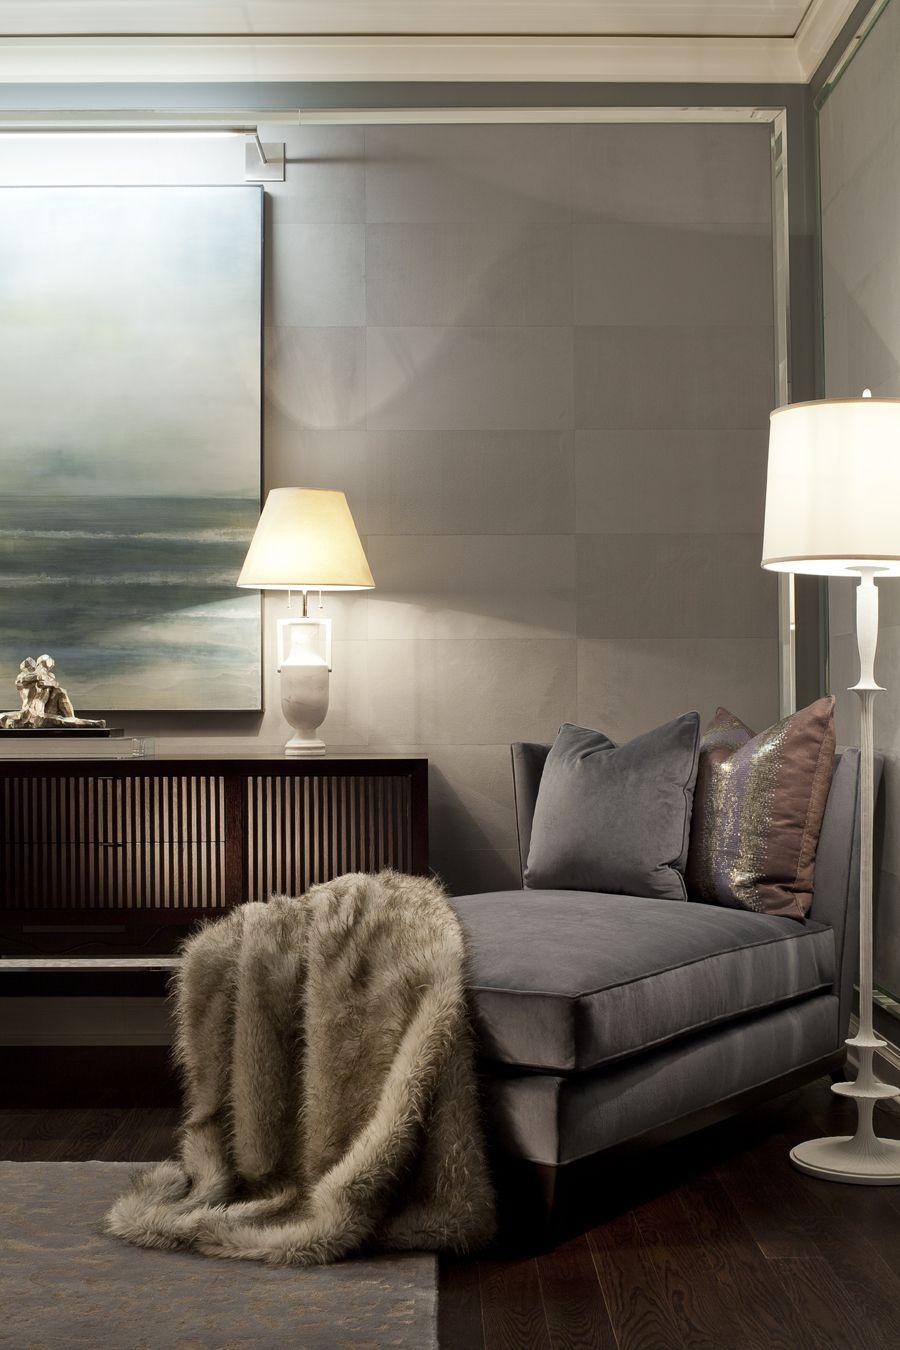 Chicago Interior Designers | Chicago Interior Design Firm | Interior  Decorator | Lounge | Lighting | Flooring | Home | Décor